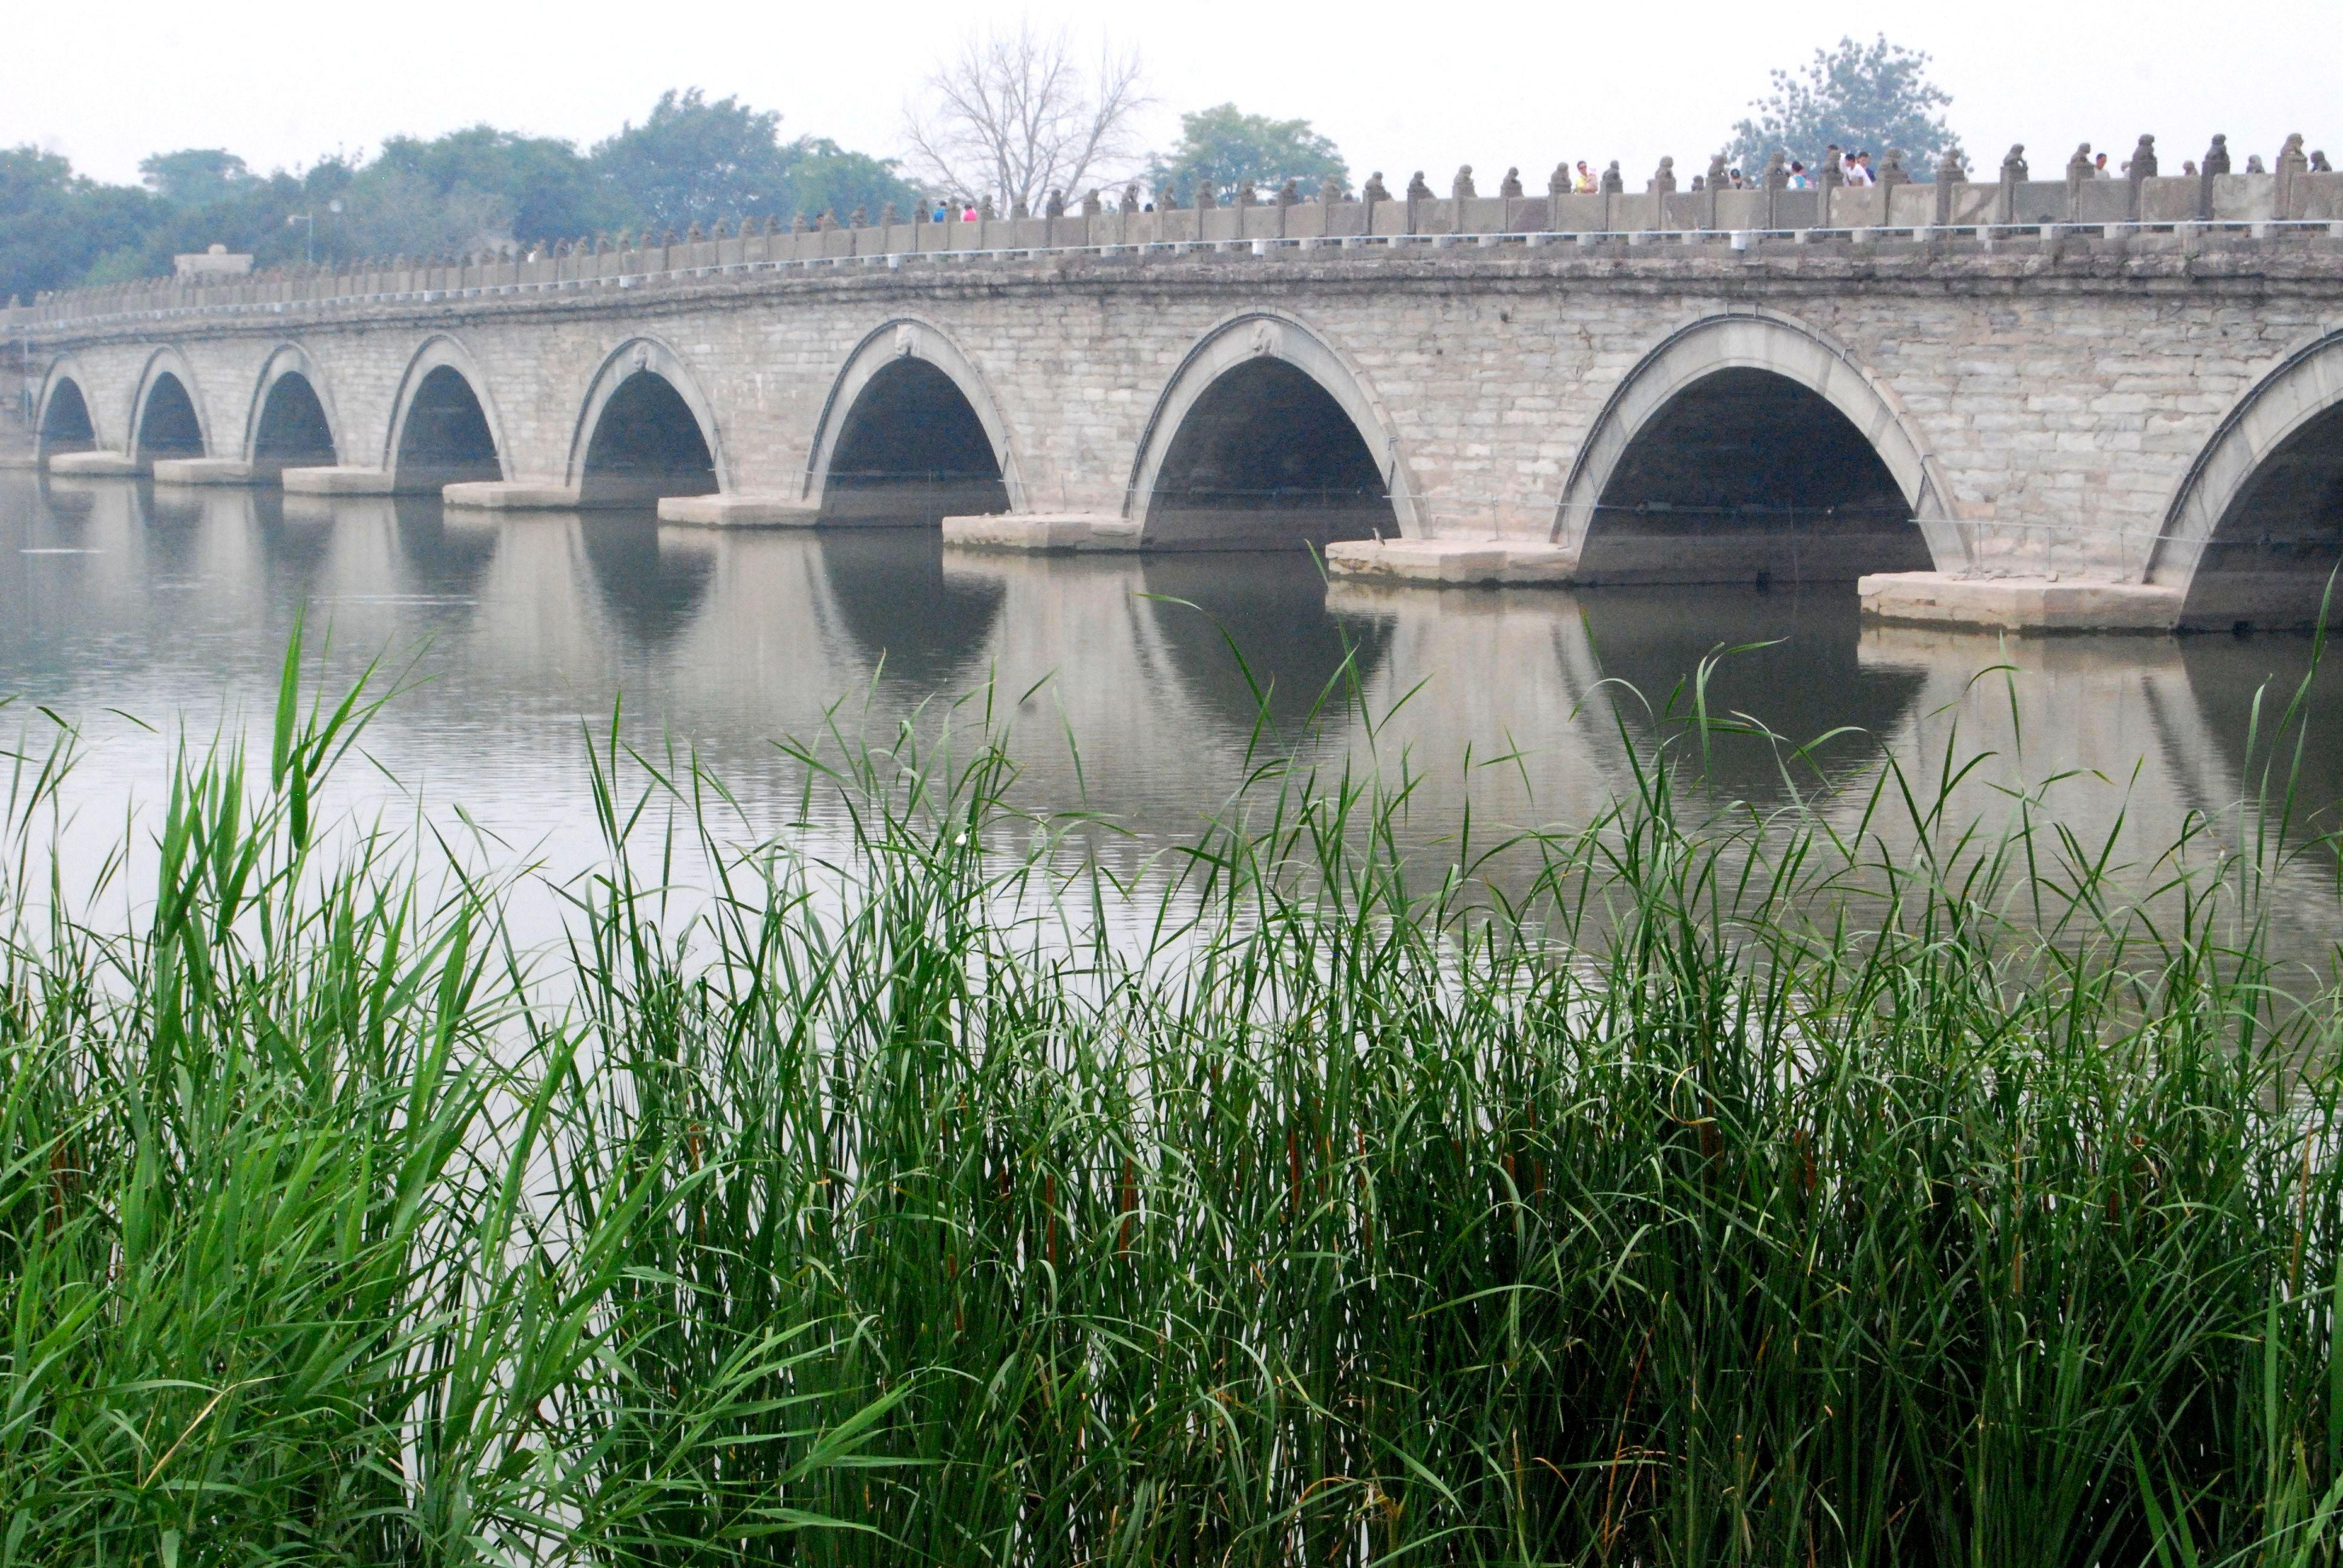 Lugouqiao – the Marco Polo Bridge | JASMINE TEA & JIAOZI